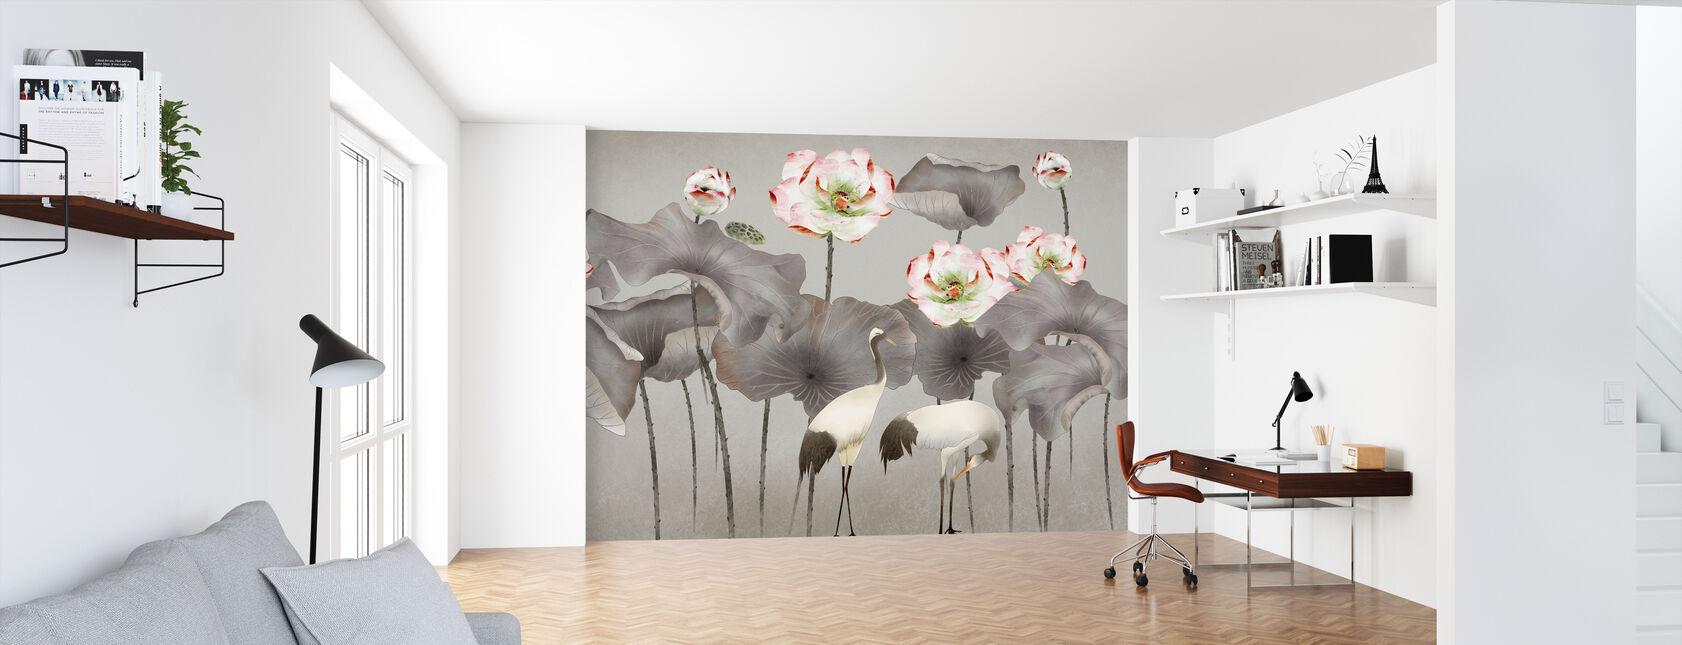 Plasir - Wallpaper - Office